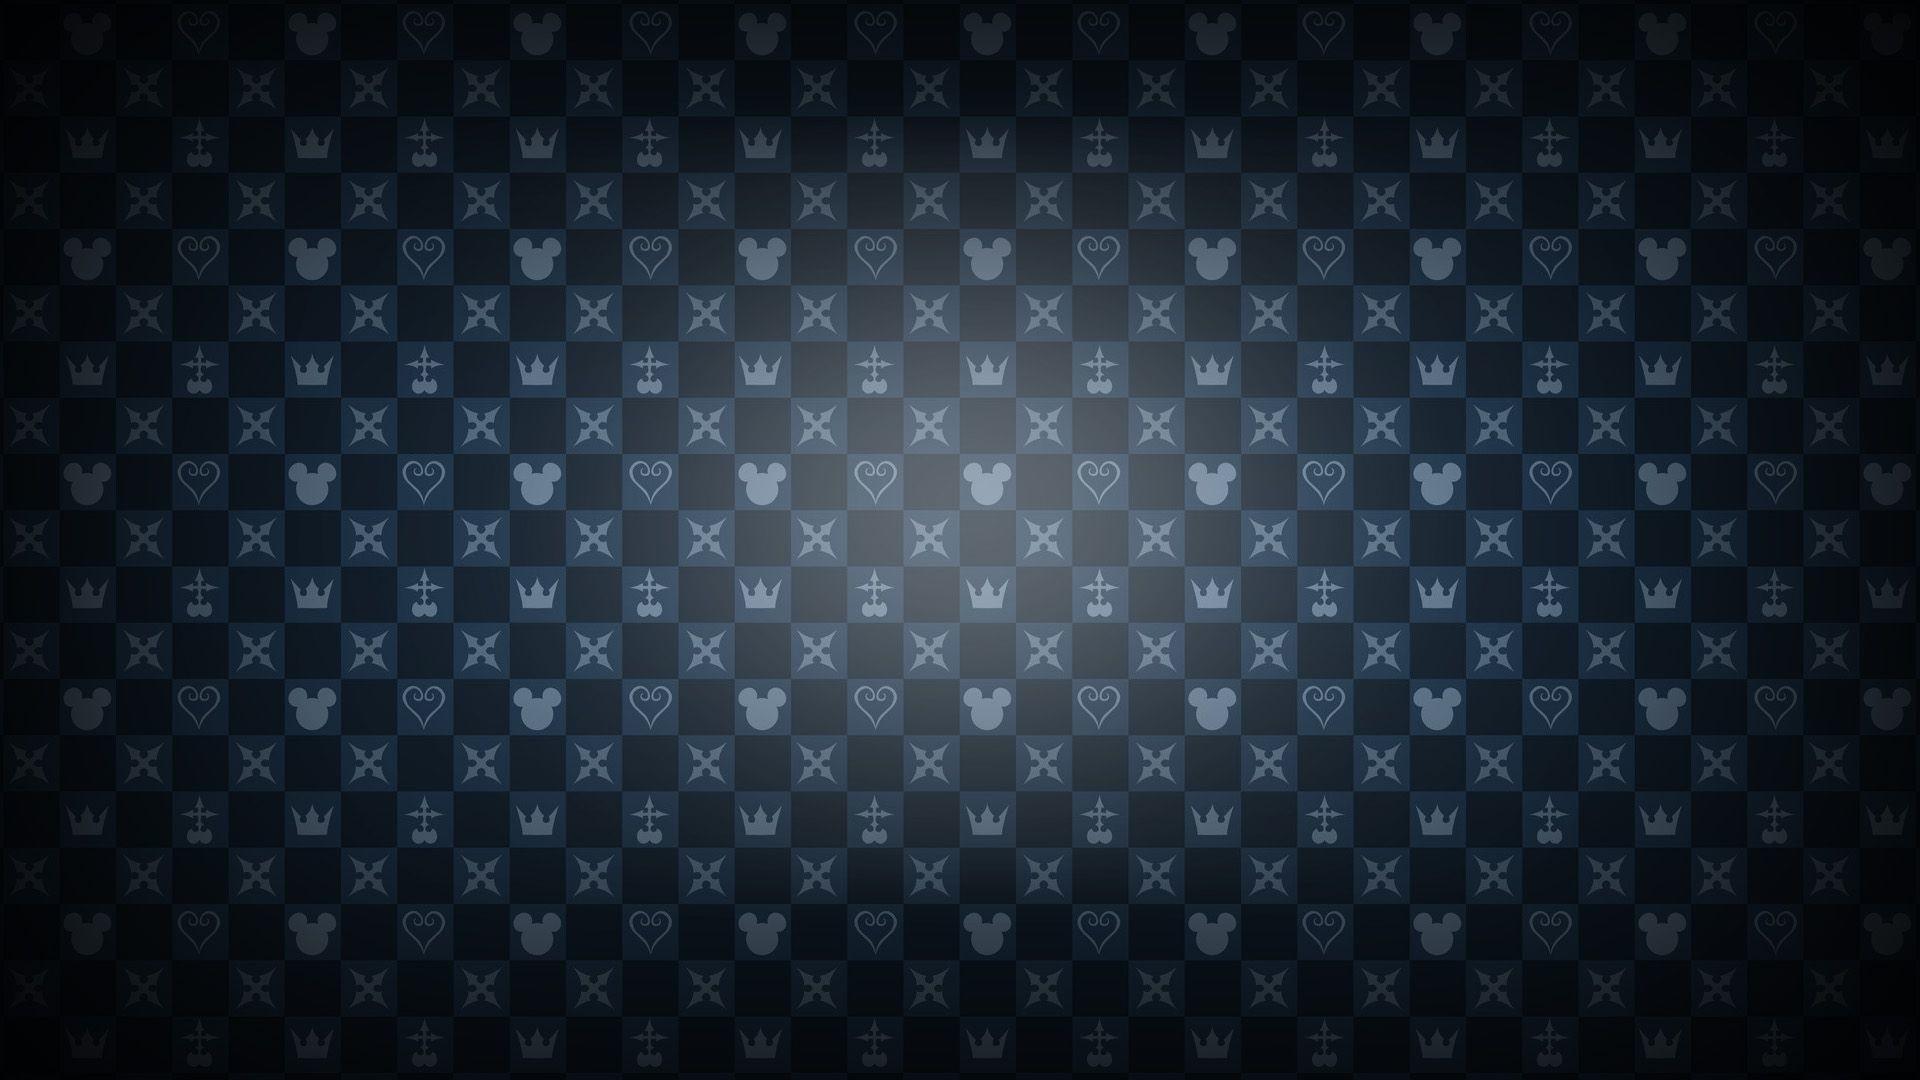 px Kingdom Hearts Desktop Backgrounds